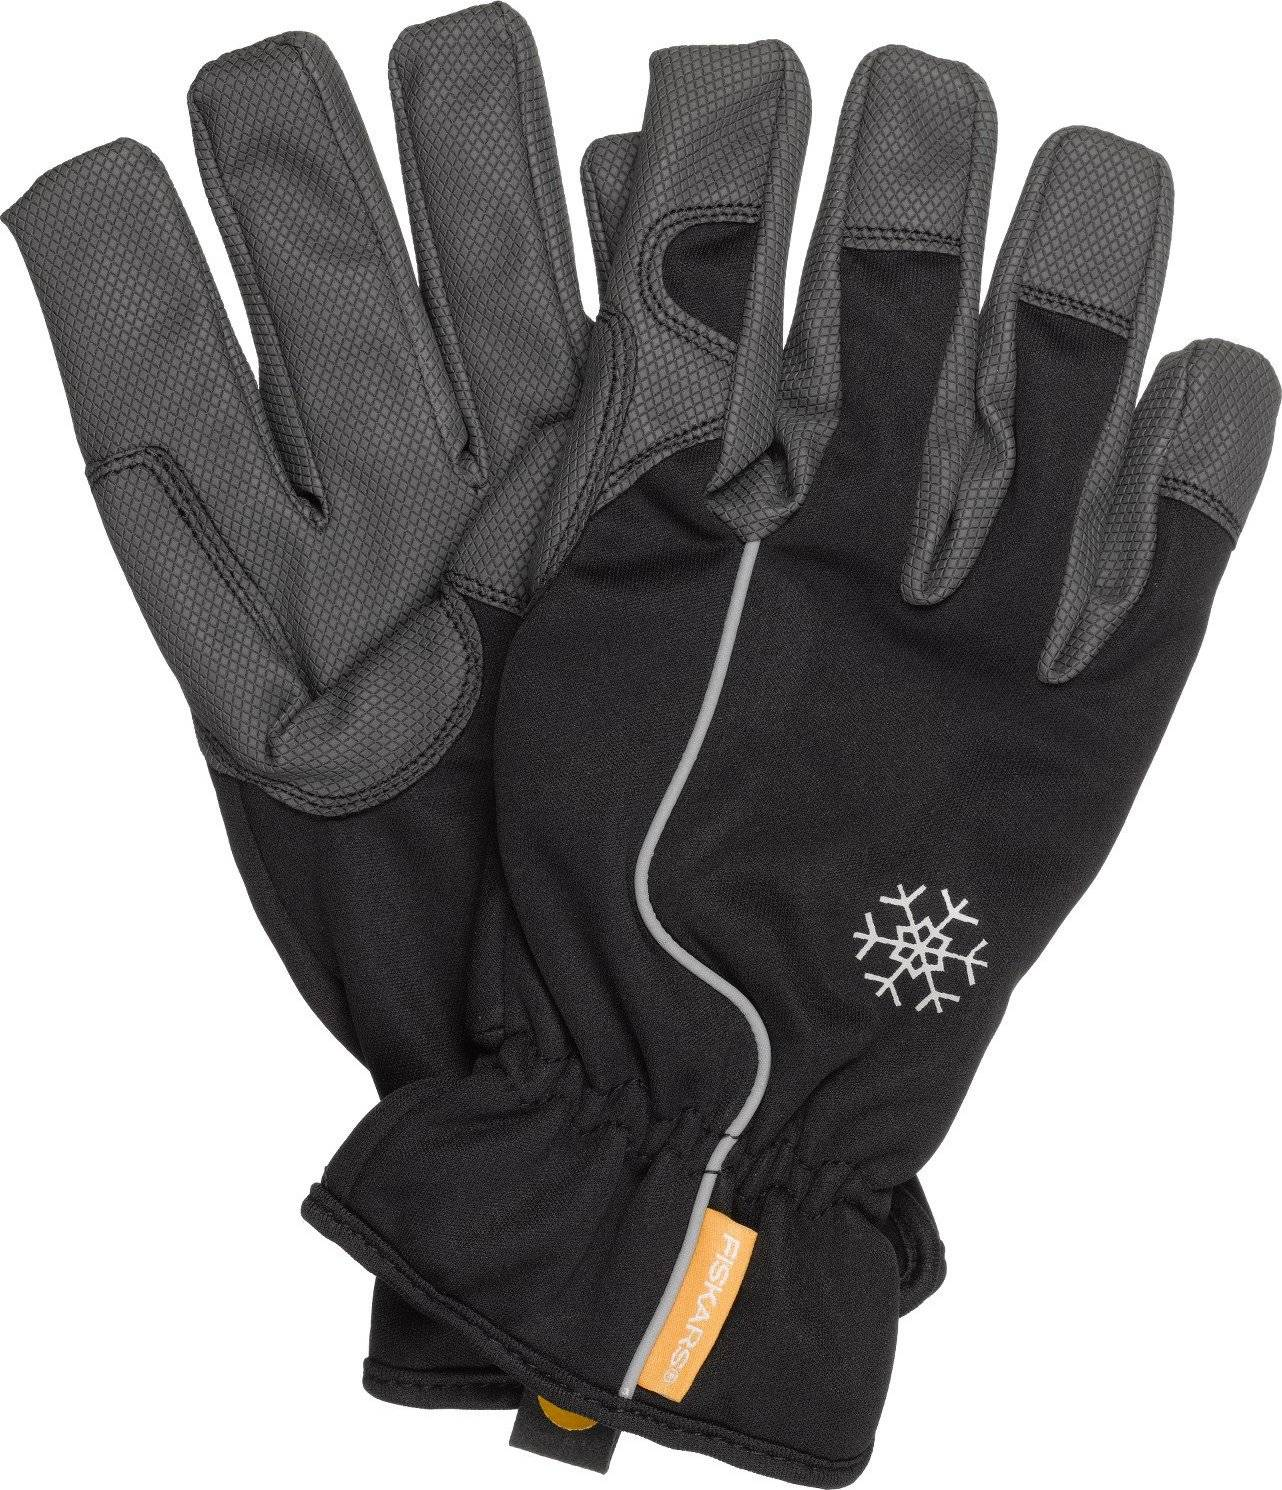 Bottari rukavice pracovni zimni  72caefad8d